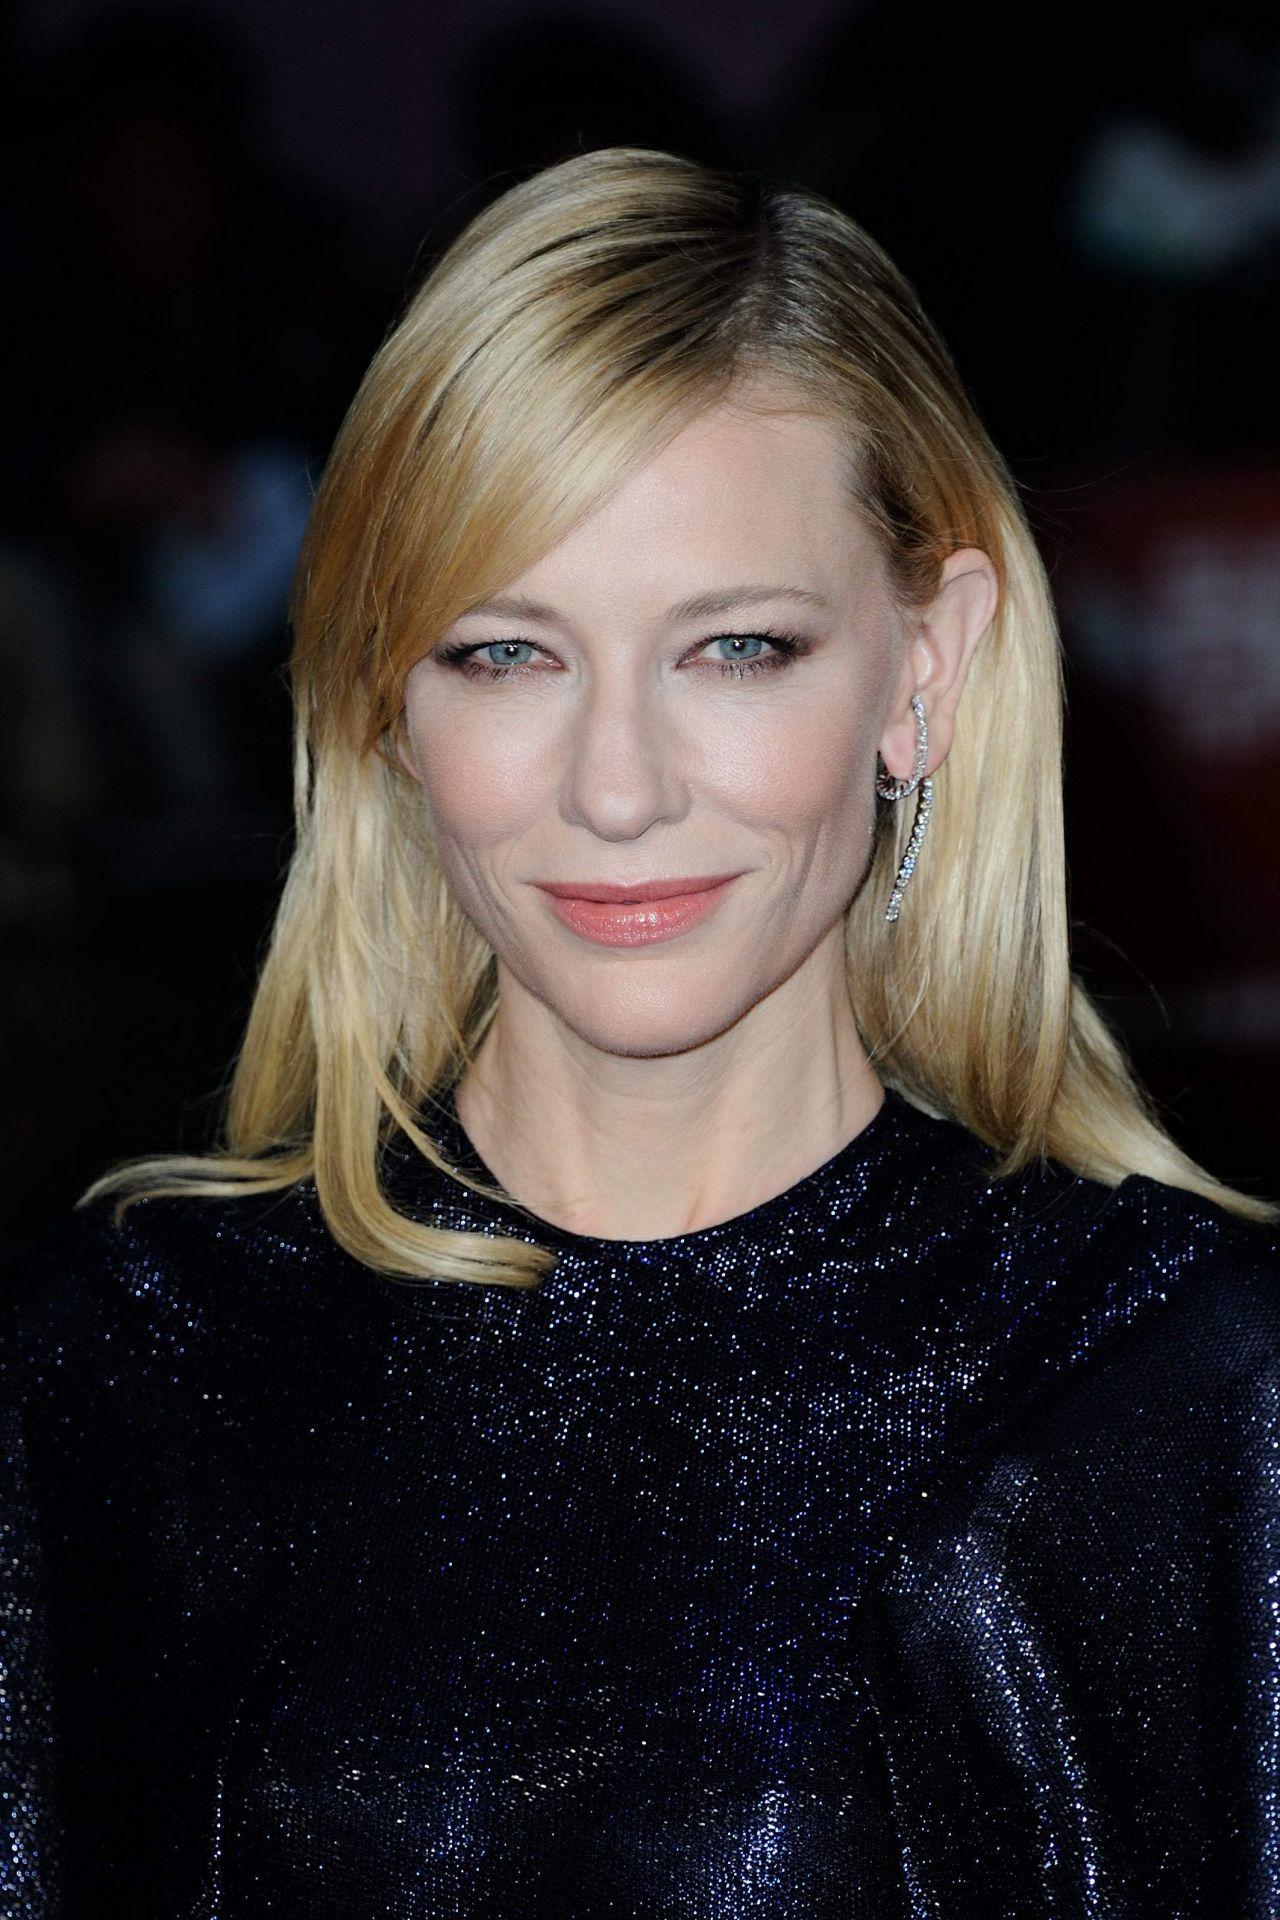 Cate Blanchett On Red Carpet Carol Premiere Bfi